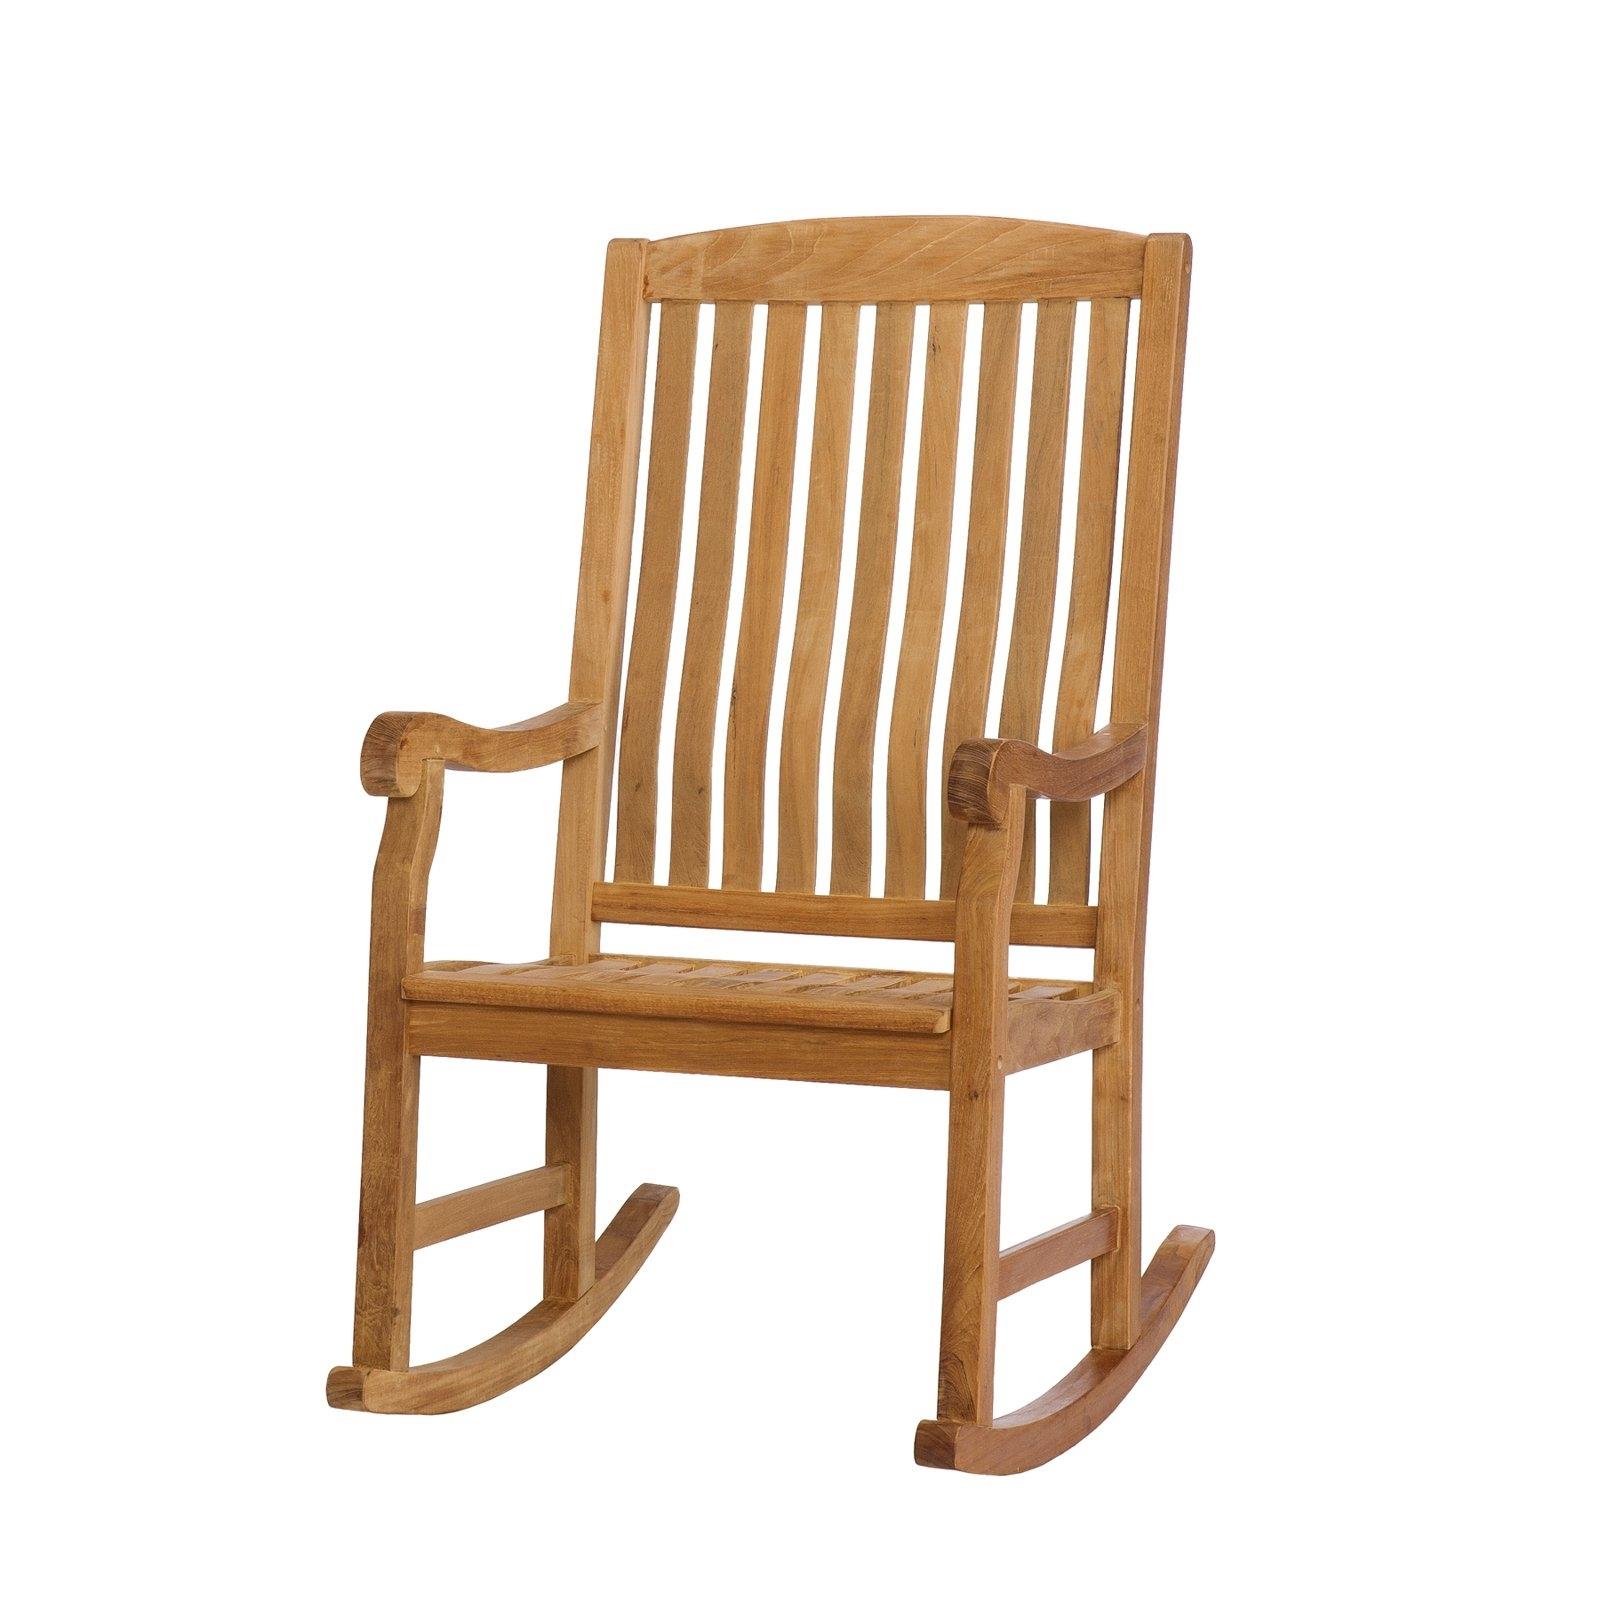 Preferred Teak Patio Rocking Chairs With Southern Enterprises Teak Porch Rocker – Natural Oil – Walmart (View 12 of 20)